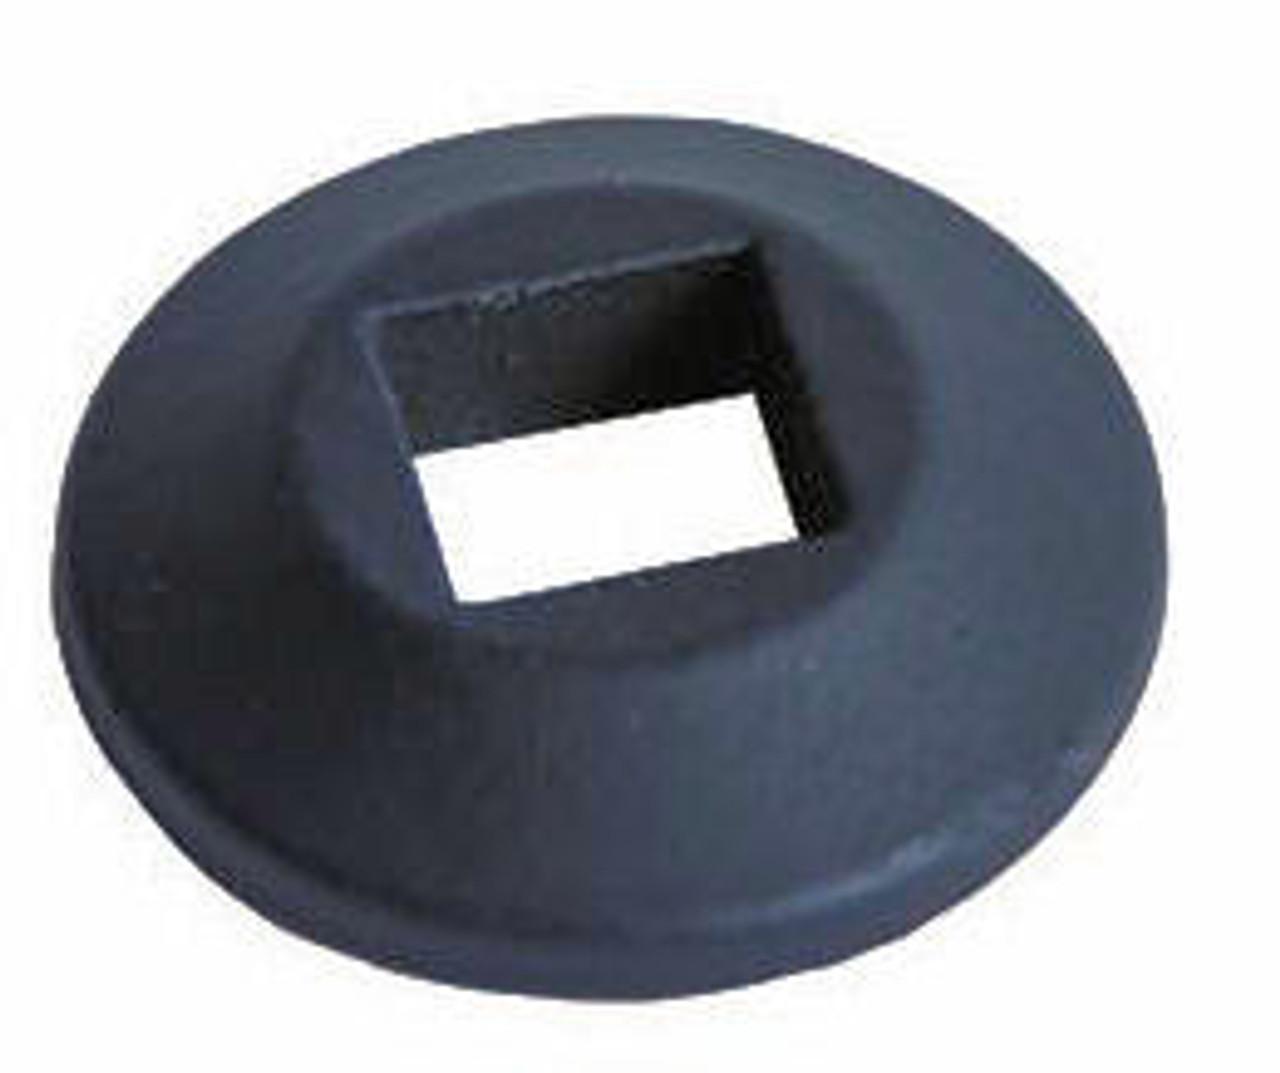 Modern Disk Shoes for Square Balusters Satin Black